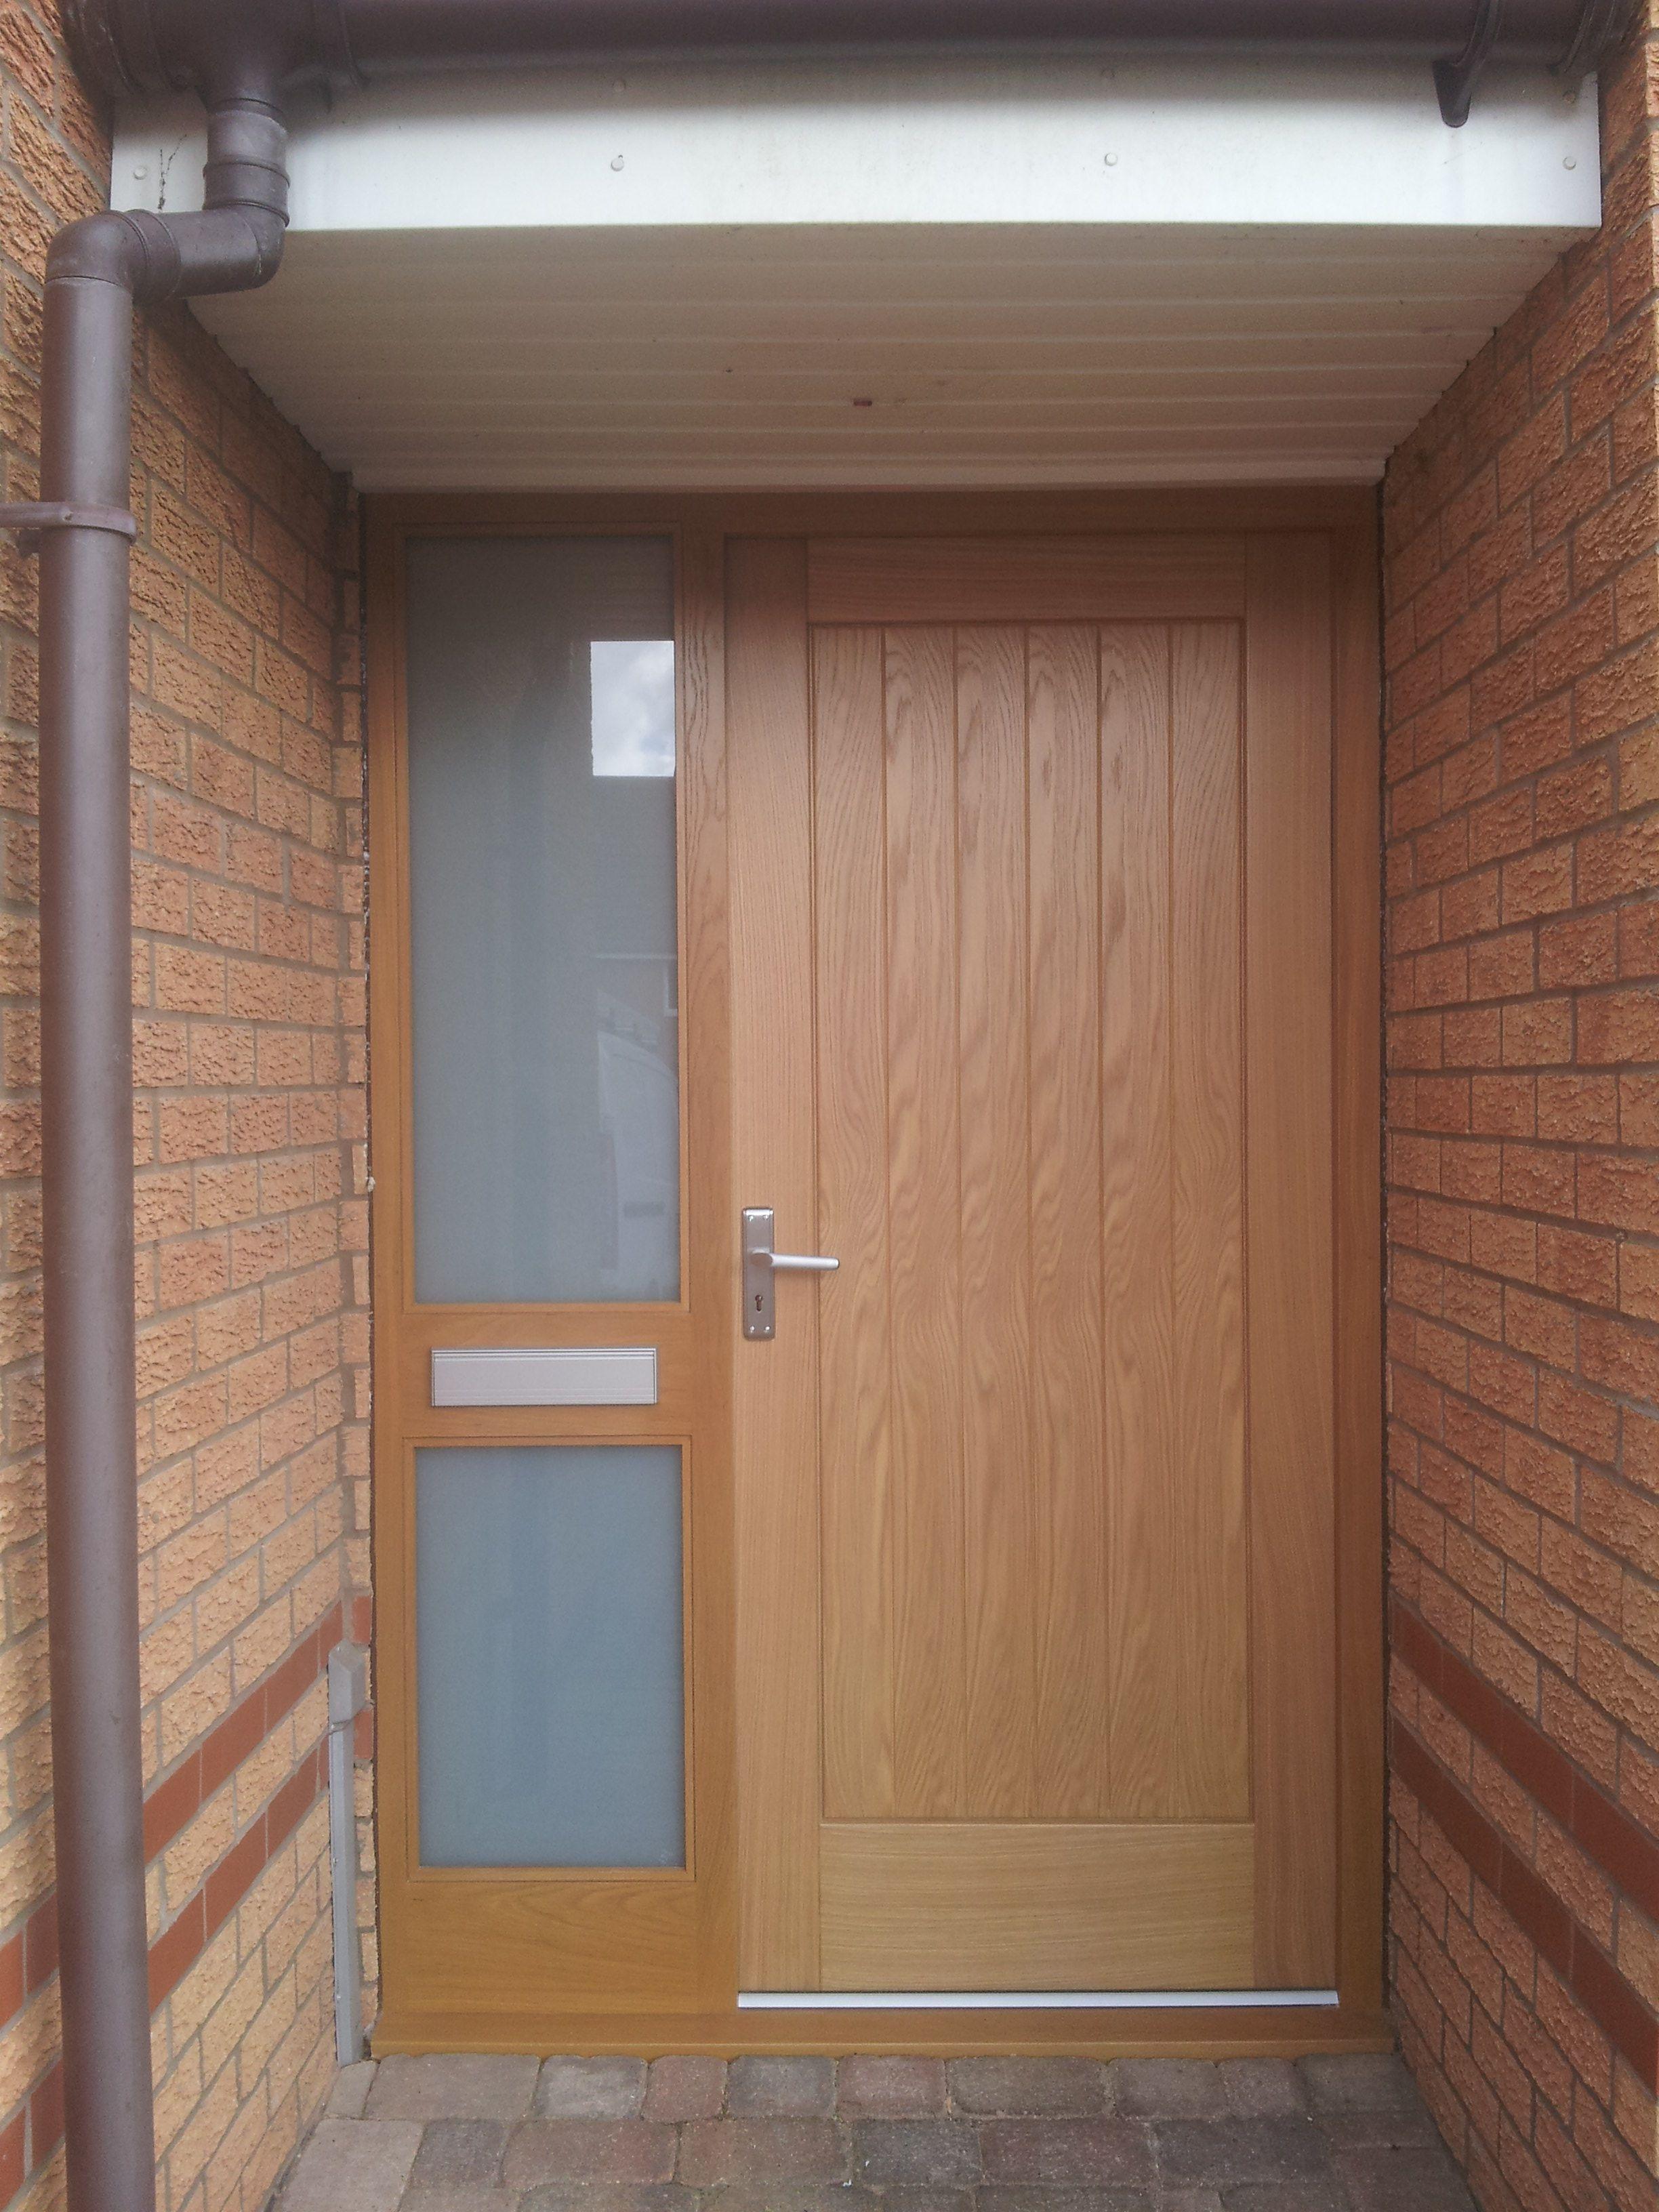 Oak Entrance With Satin Glazed Side Panel And Satin Finish